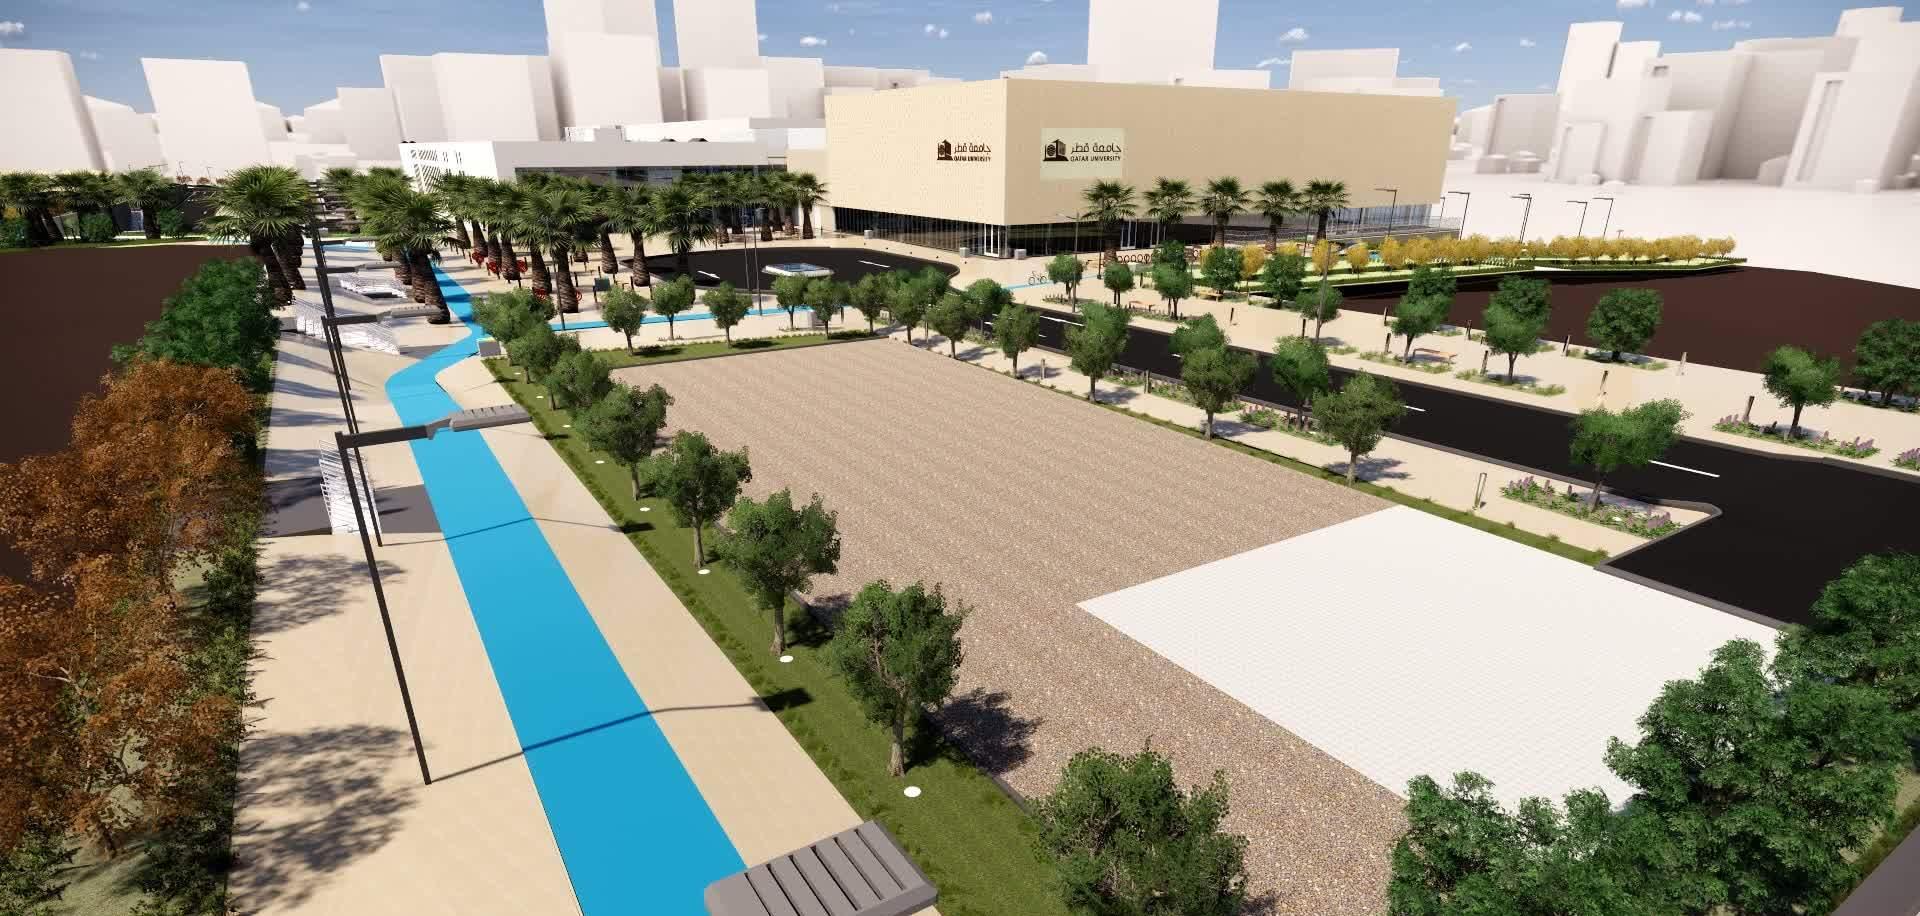 Qatar University Sports and Events Complex